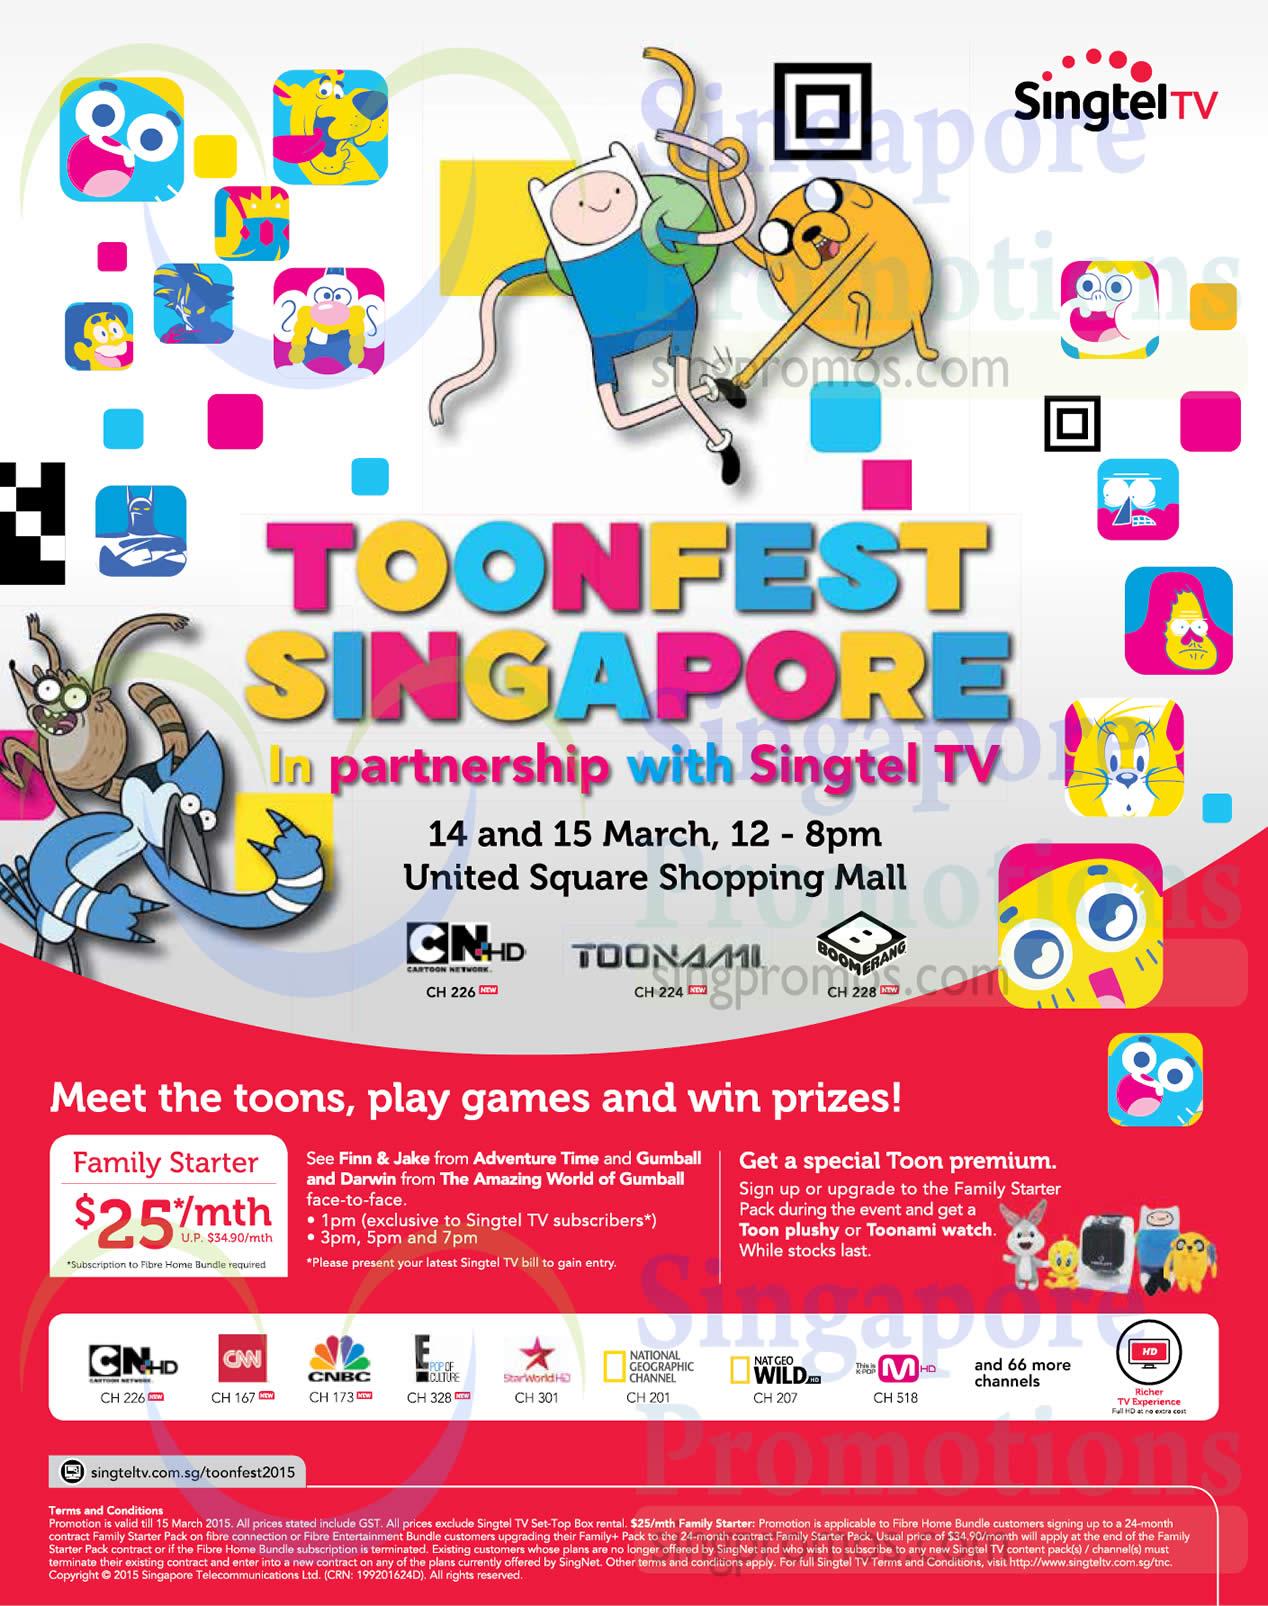 Mio TV 25.00 Family Starter Pack, Toonfest Singapore Roadshow